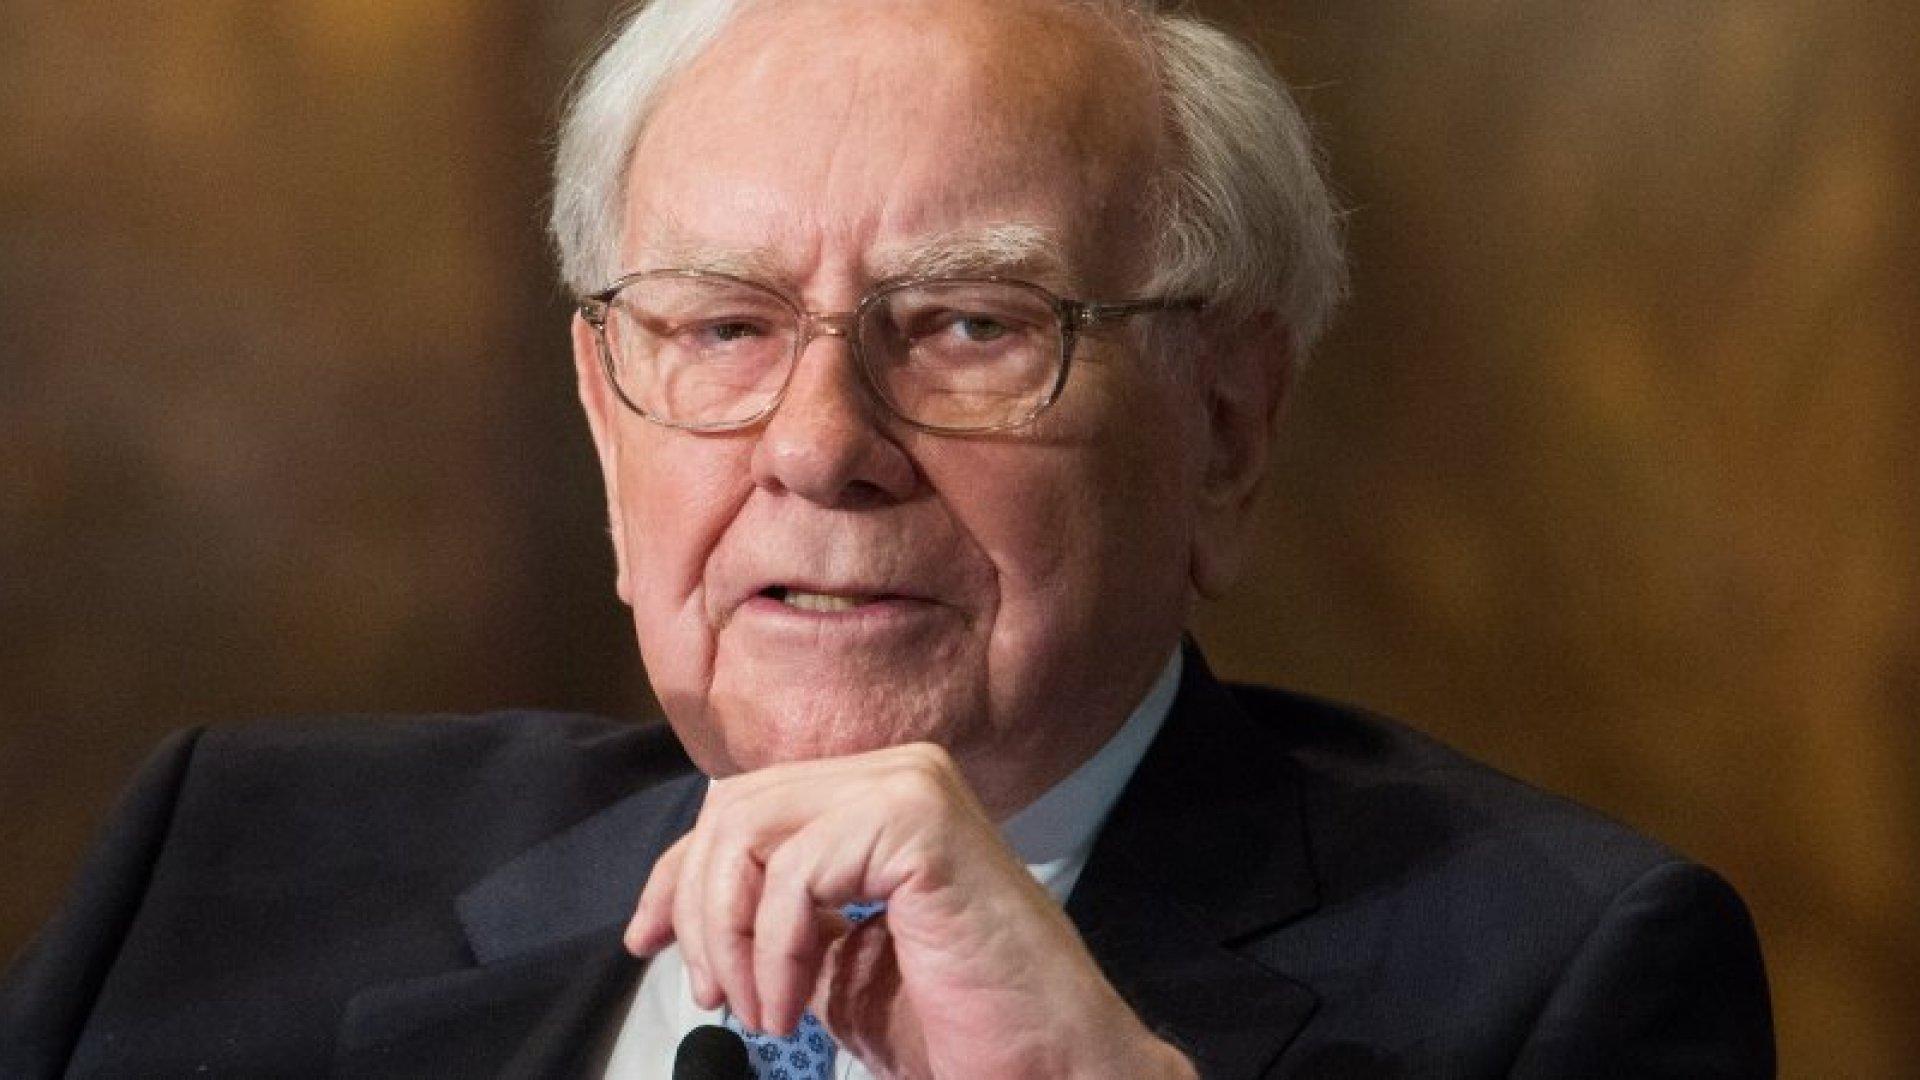 7 Things Warren Buffett Can Teach You About Leadership